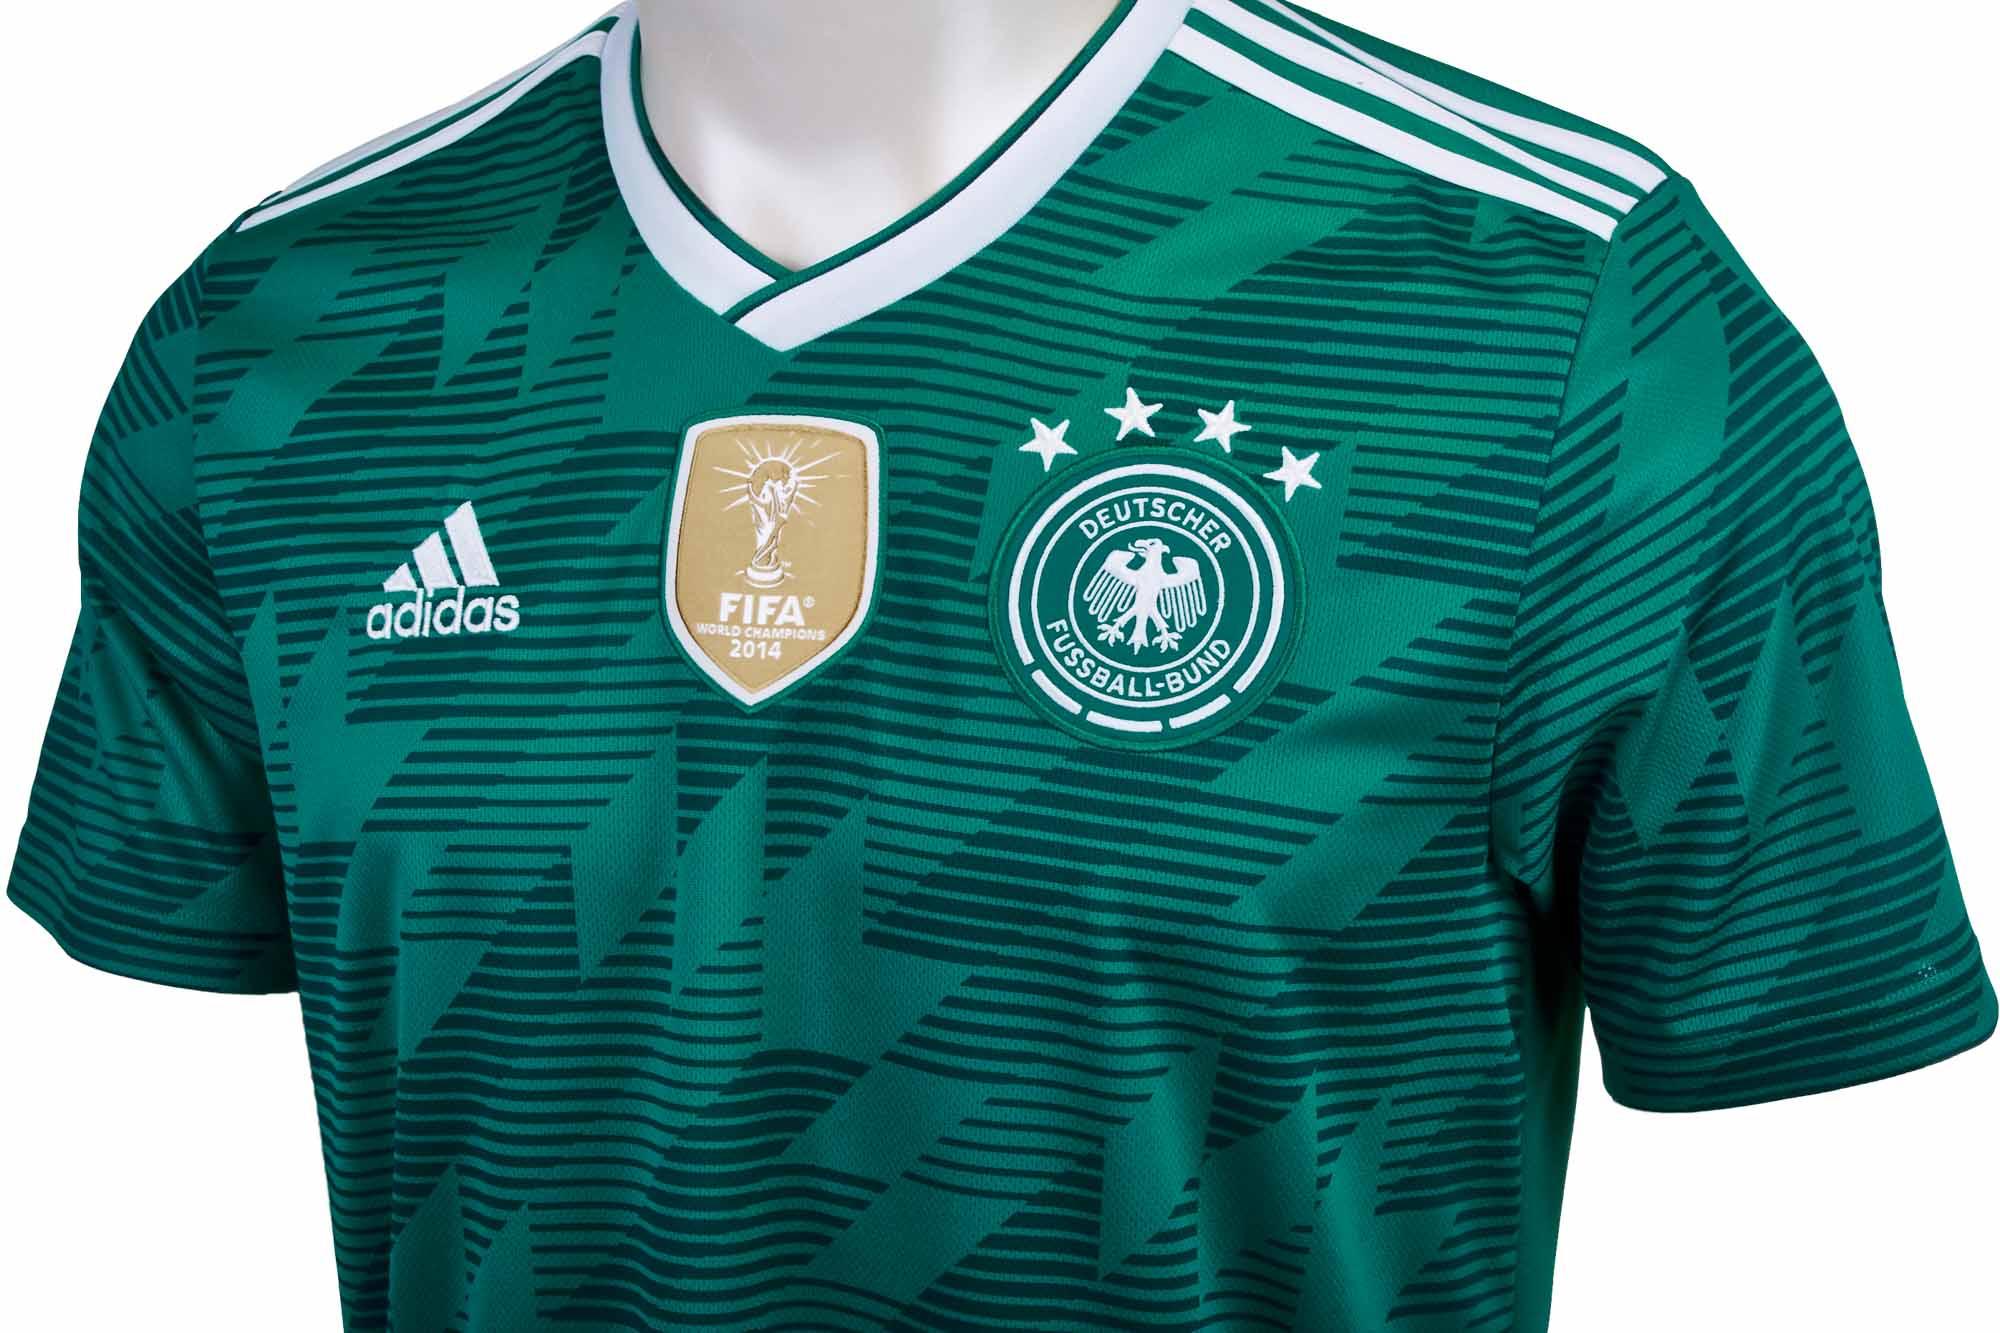 the best attitude 076d8 5f89a adidas Germany Away Jersey 2018-19 - SoccerPro.com